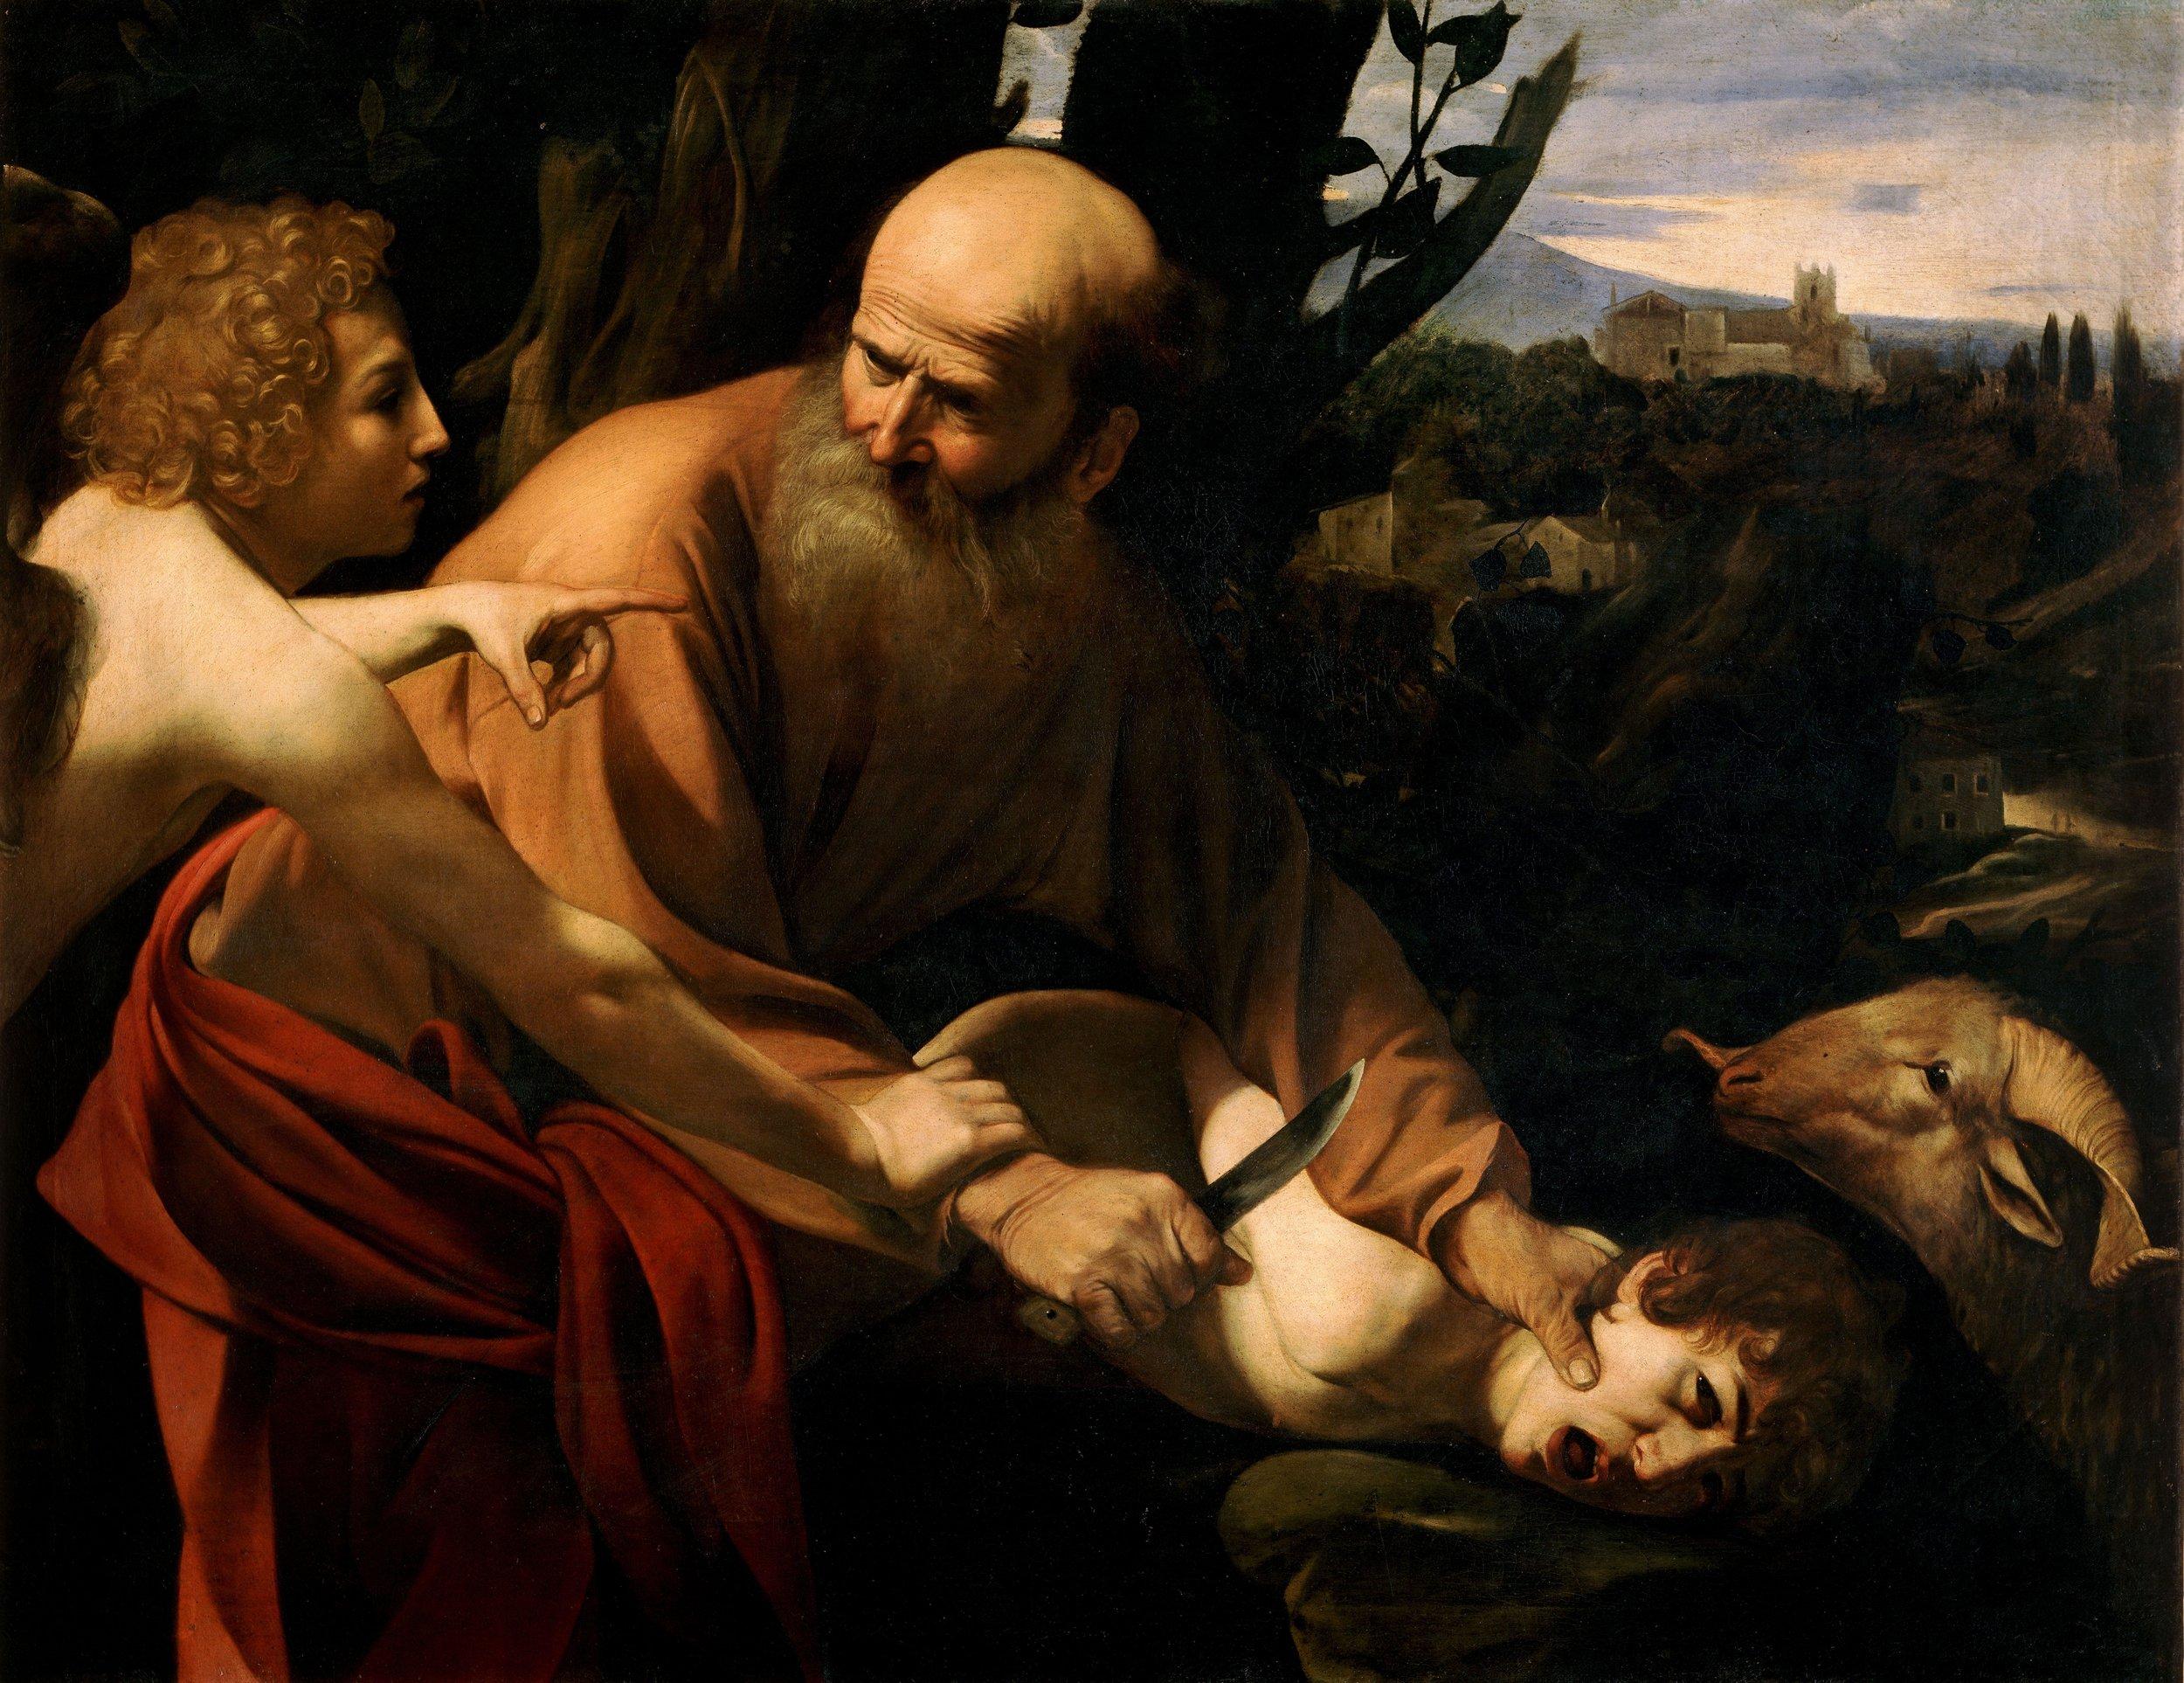 caravaggio - sacrifice of isaac, 1603. image courtesy of galleria degli uffizi, firenze